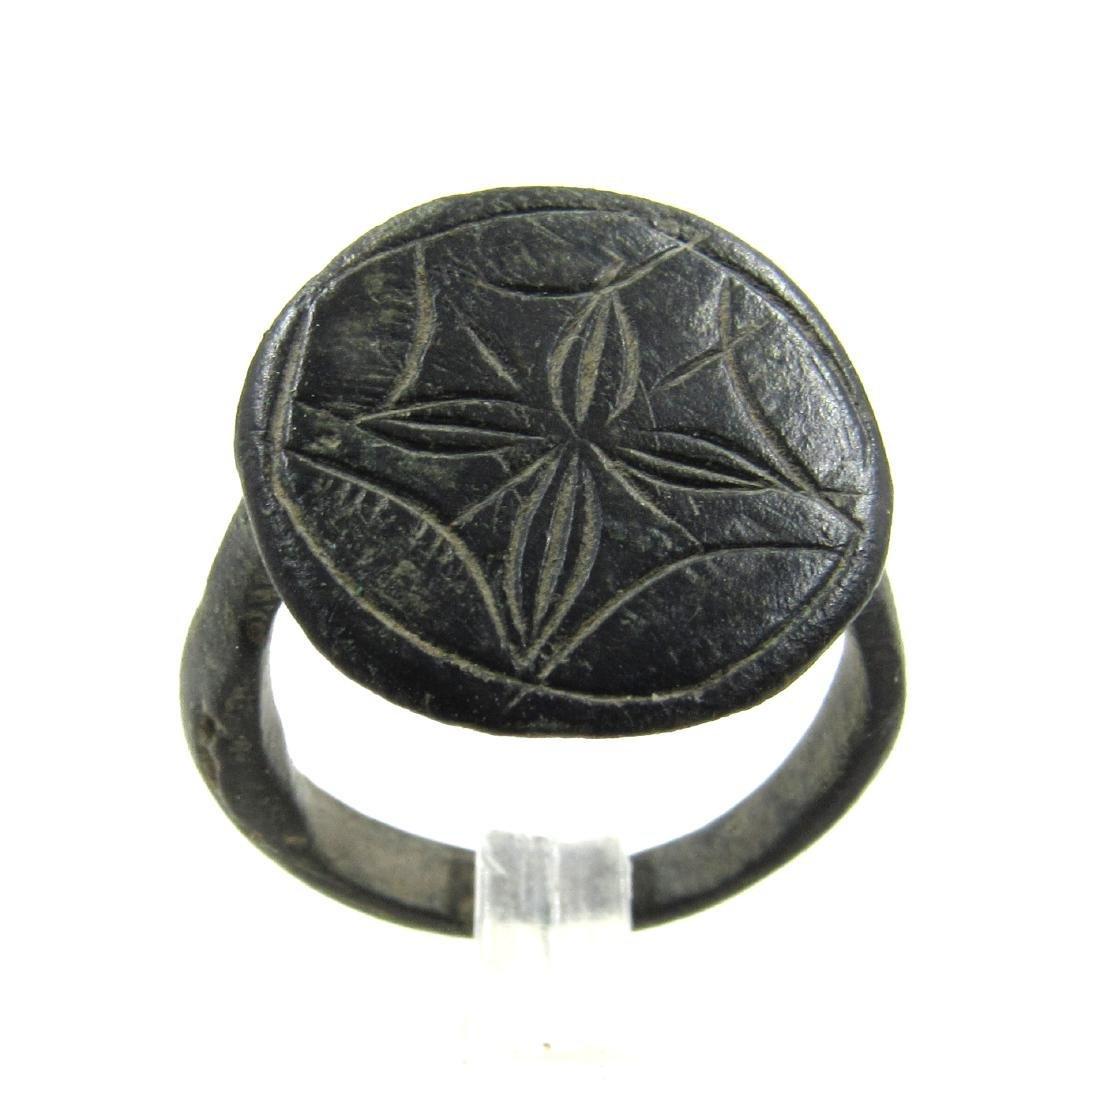 Medieval Crusaders Era Bronze Star of Bethlehem Ring